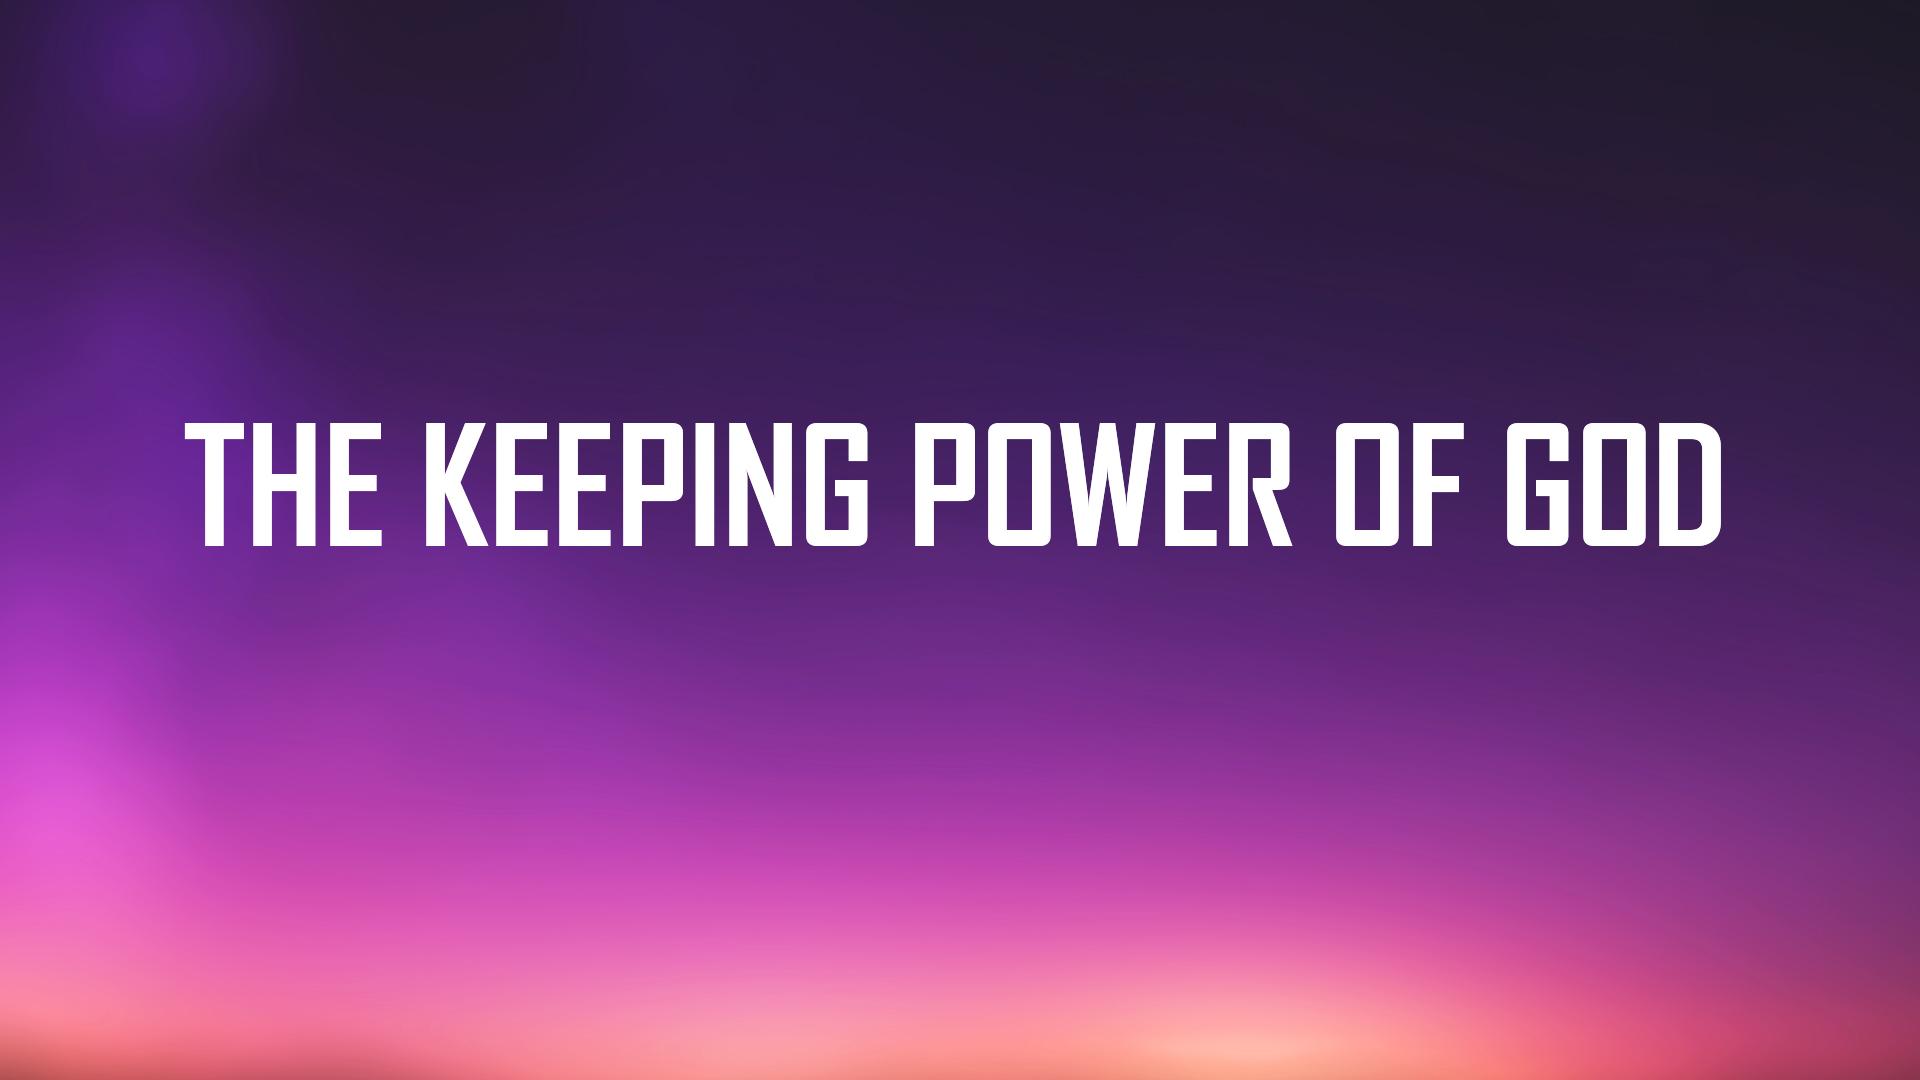 Joy of the redeemed part 15 Keeping Power of God<br/>Mathai John